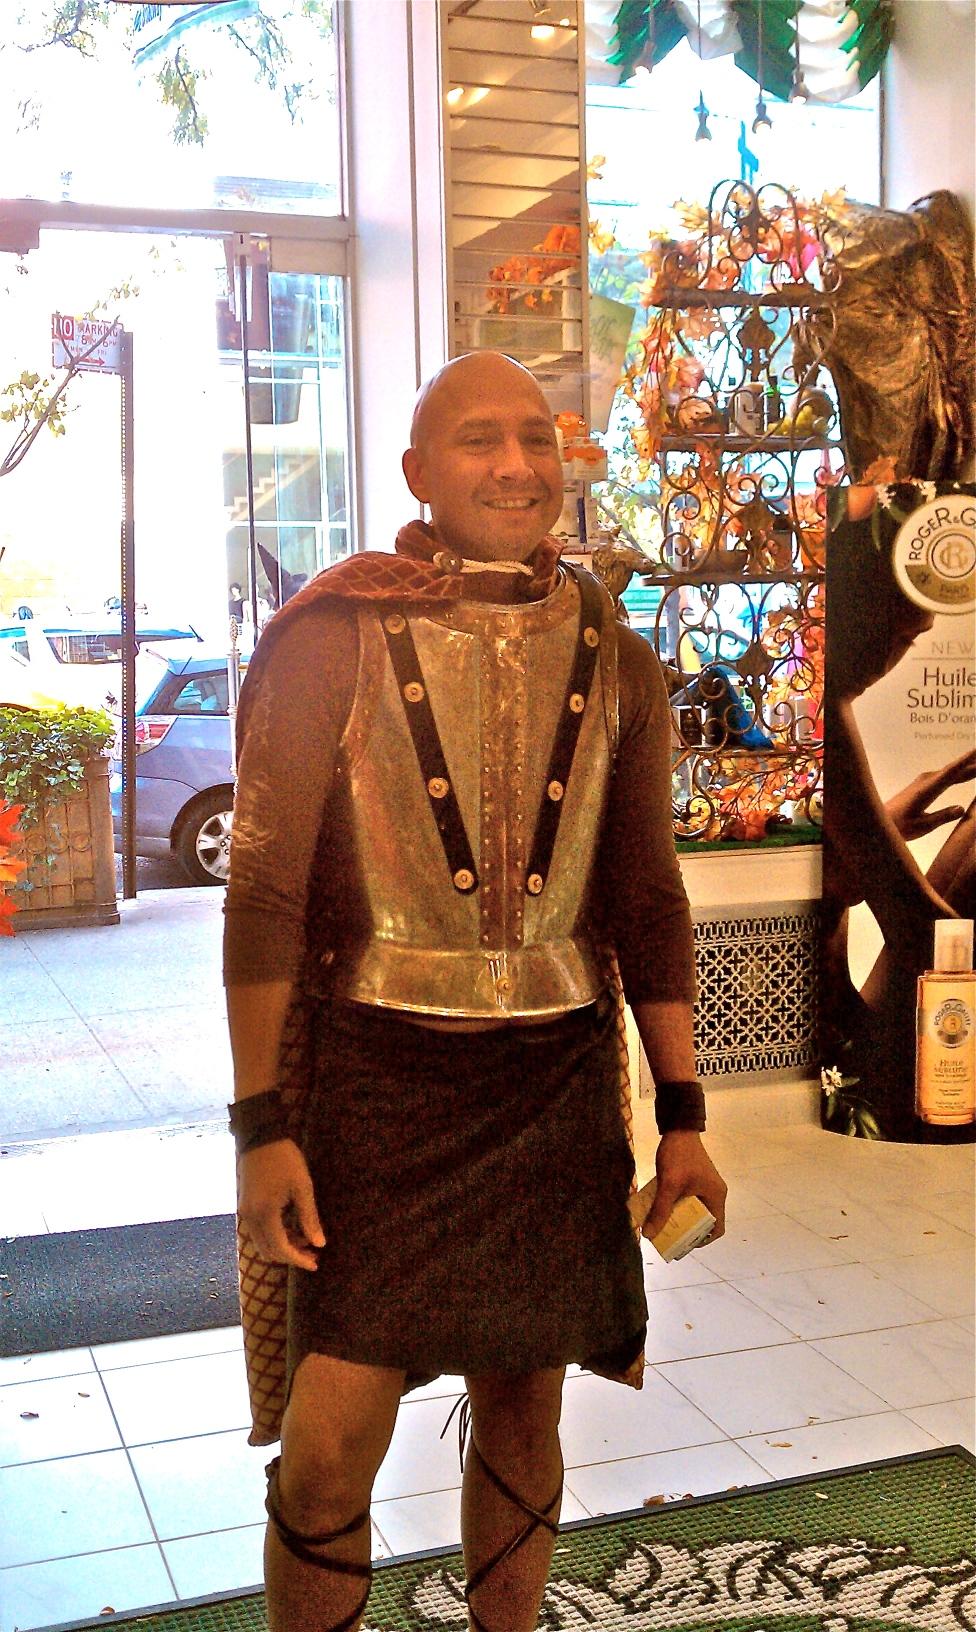 Halloween at Thompson Alchemists 449 West Broadway Soho, NYC 10012